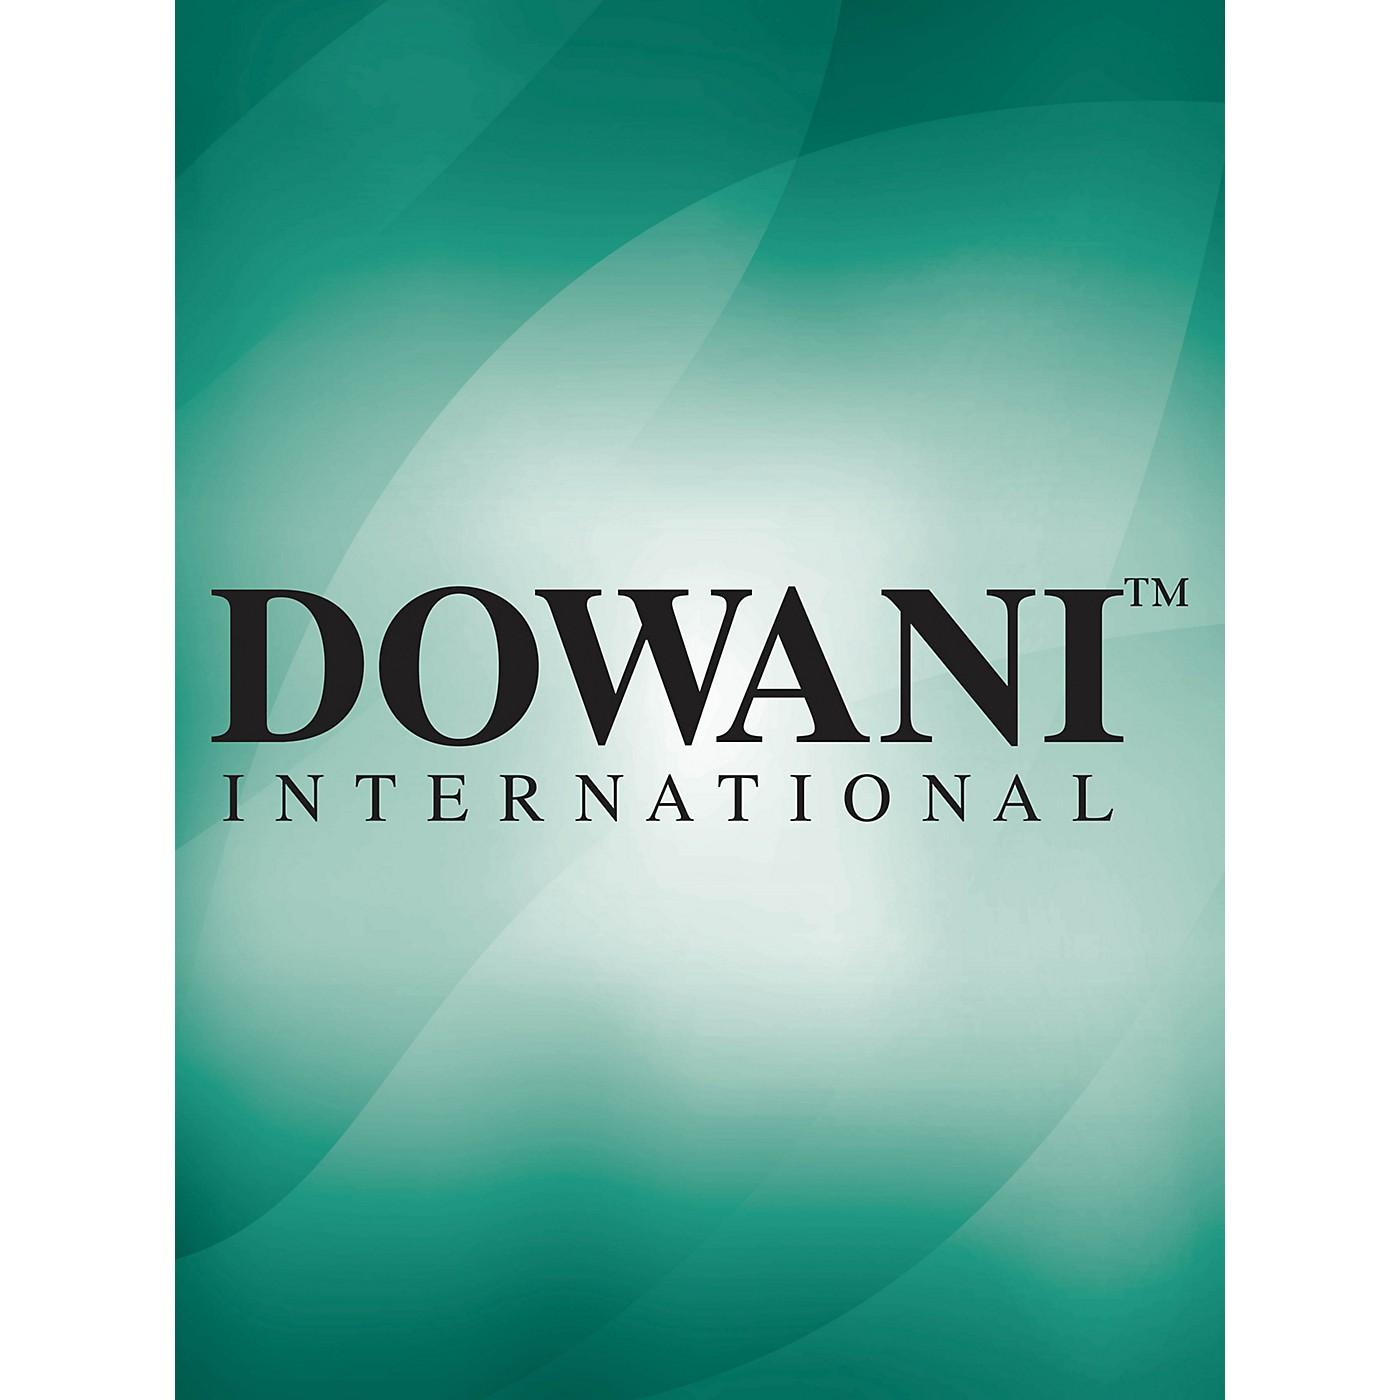 Hal Leonard Weihnachten Im Barockstil Soprano Recorder/pno BkCD (easy) Dowani Book/CD Series thumbnail